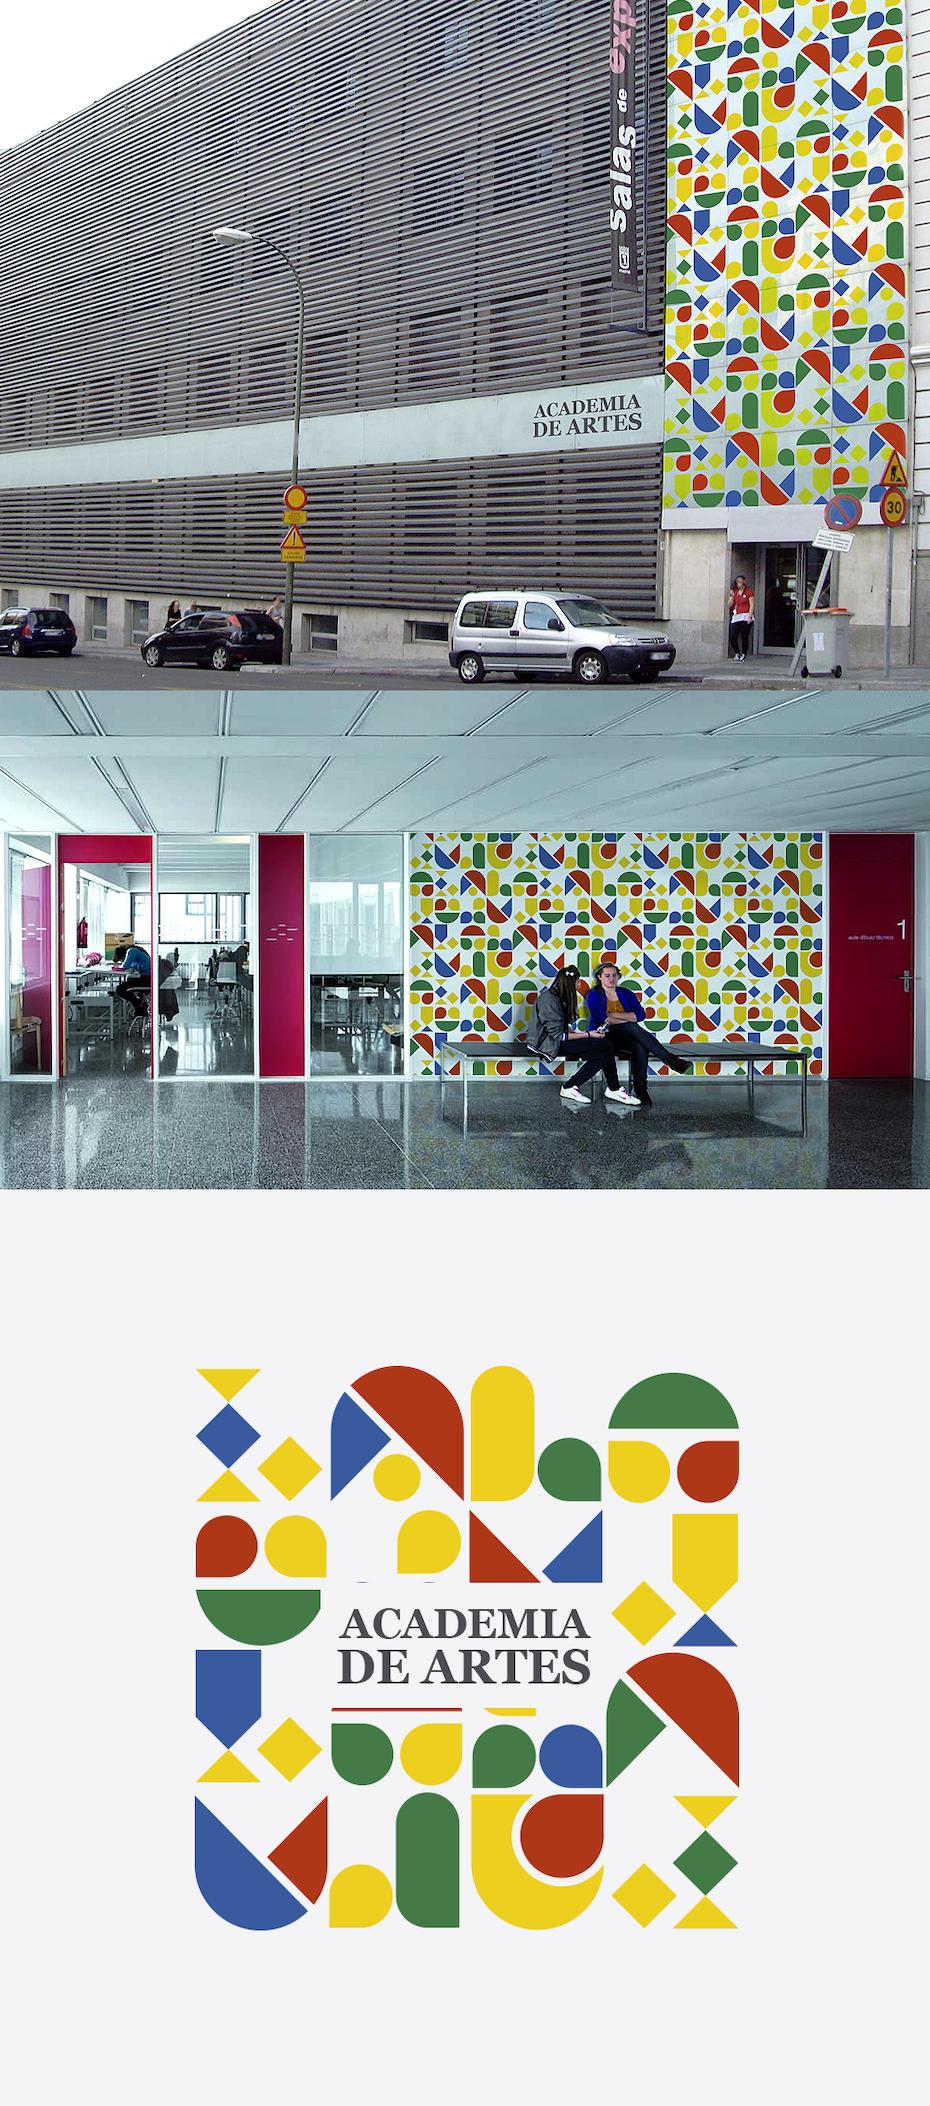 Multicolored logo for Academia de Artes